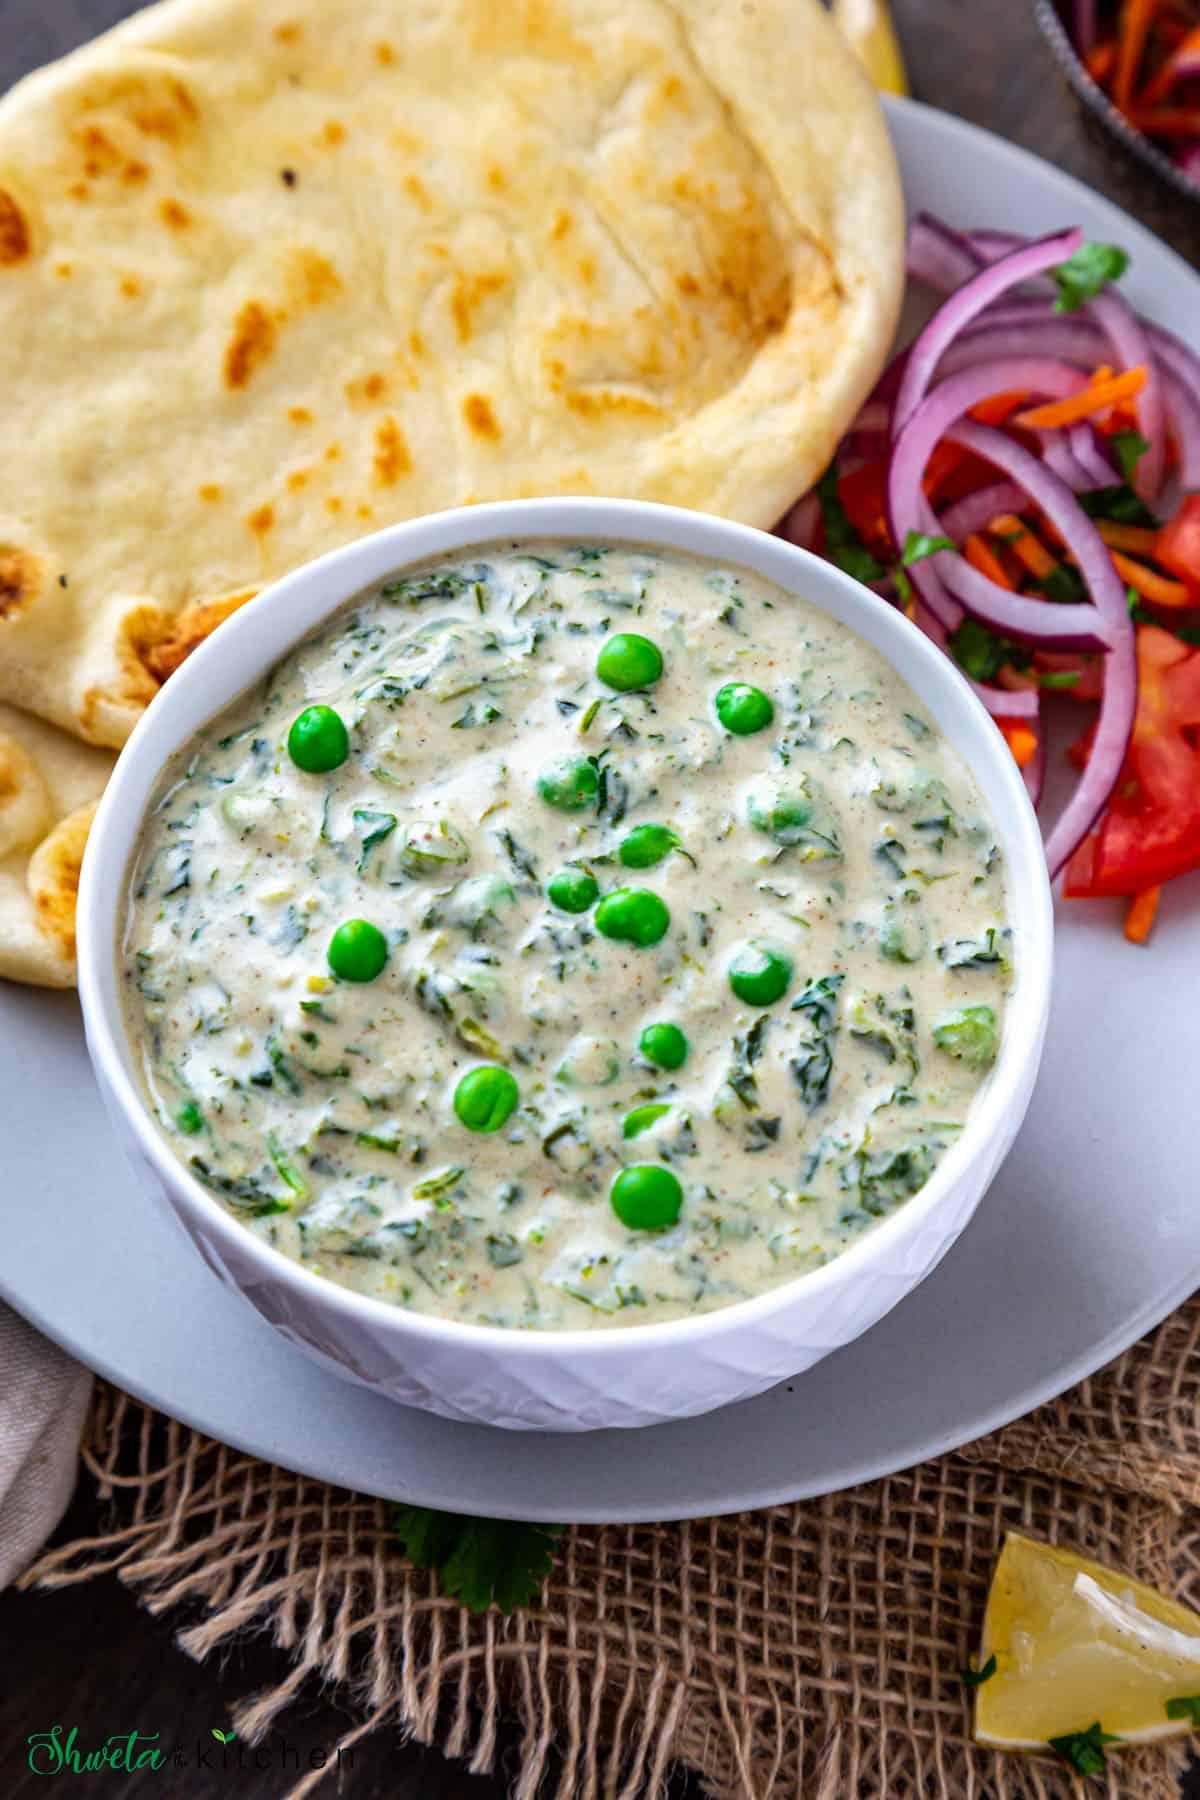 Bowl of Methi Matar Malai with naan and mix veg salad on a plate